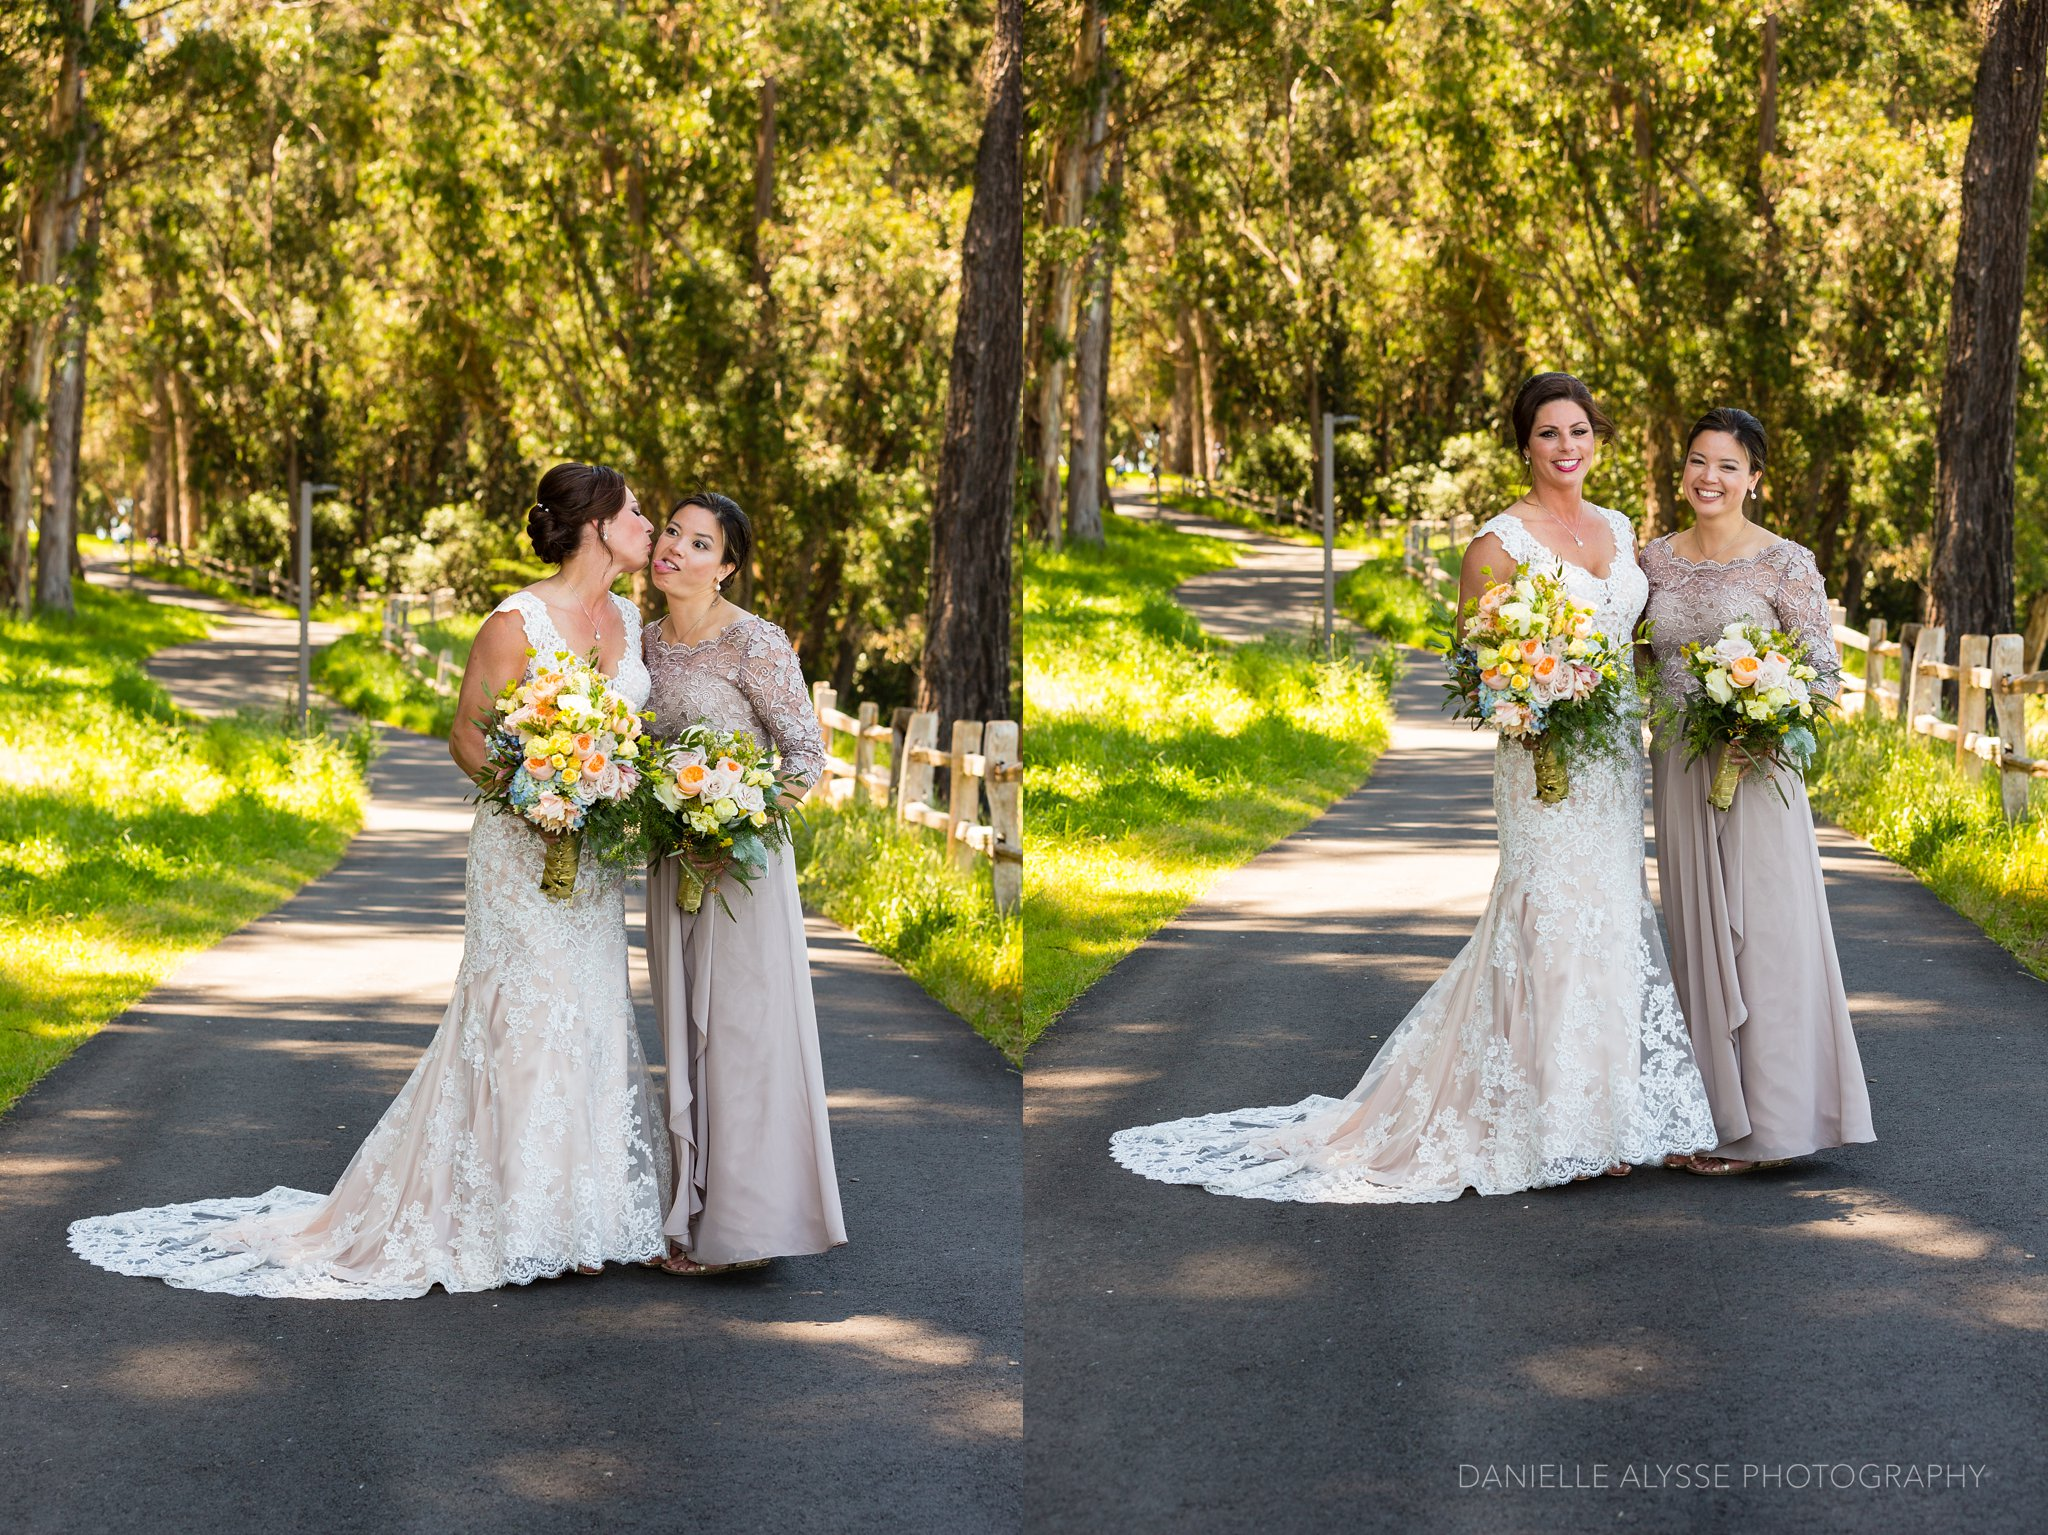 170429_blog_kimberly_ben_wedding_san_mateo_curiodyssey_danielle_alysse_photography_sacramento_photographer0307_WEB.jpg